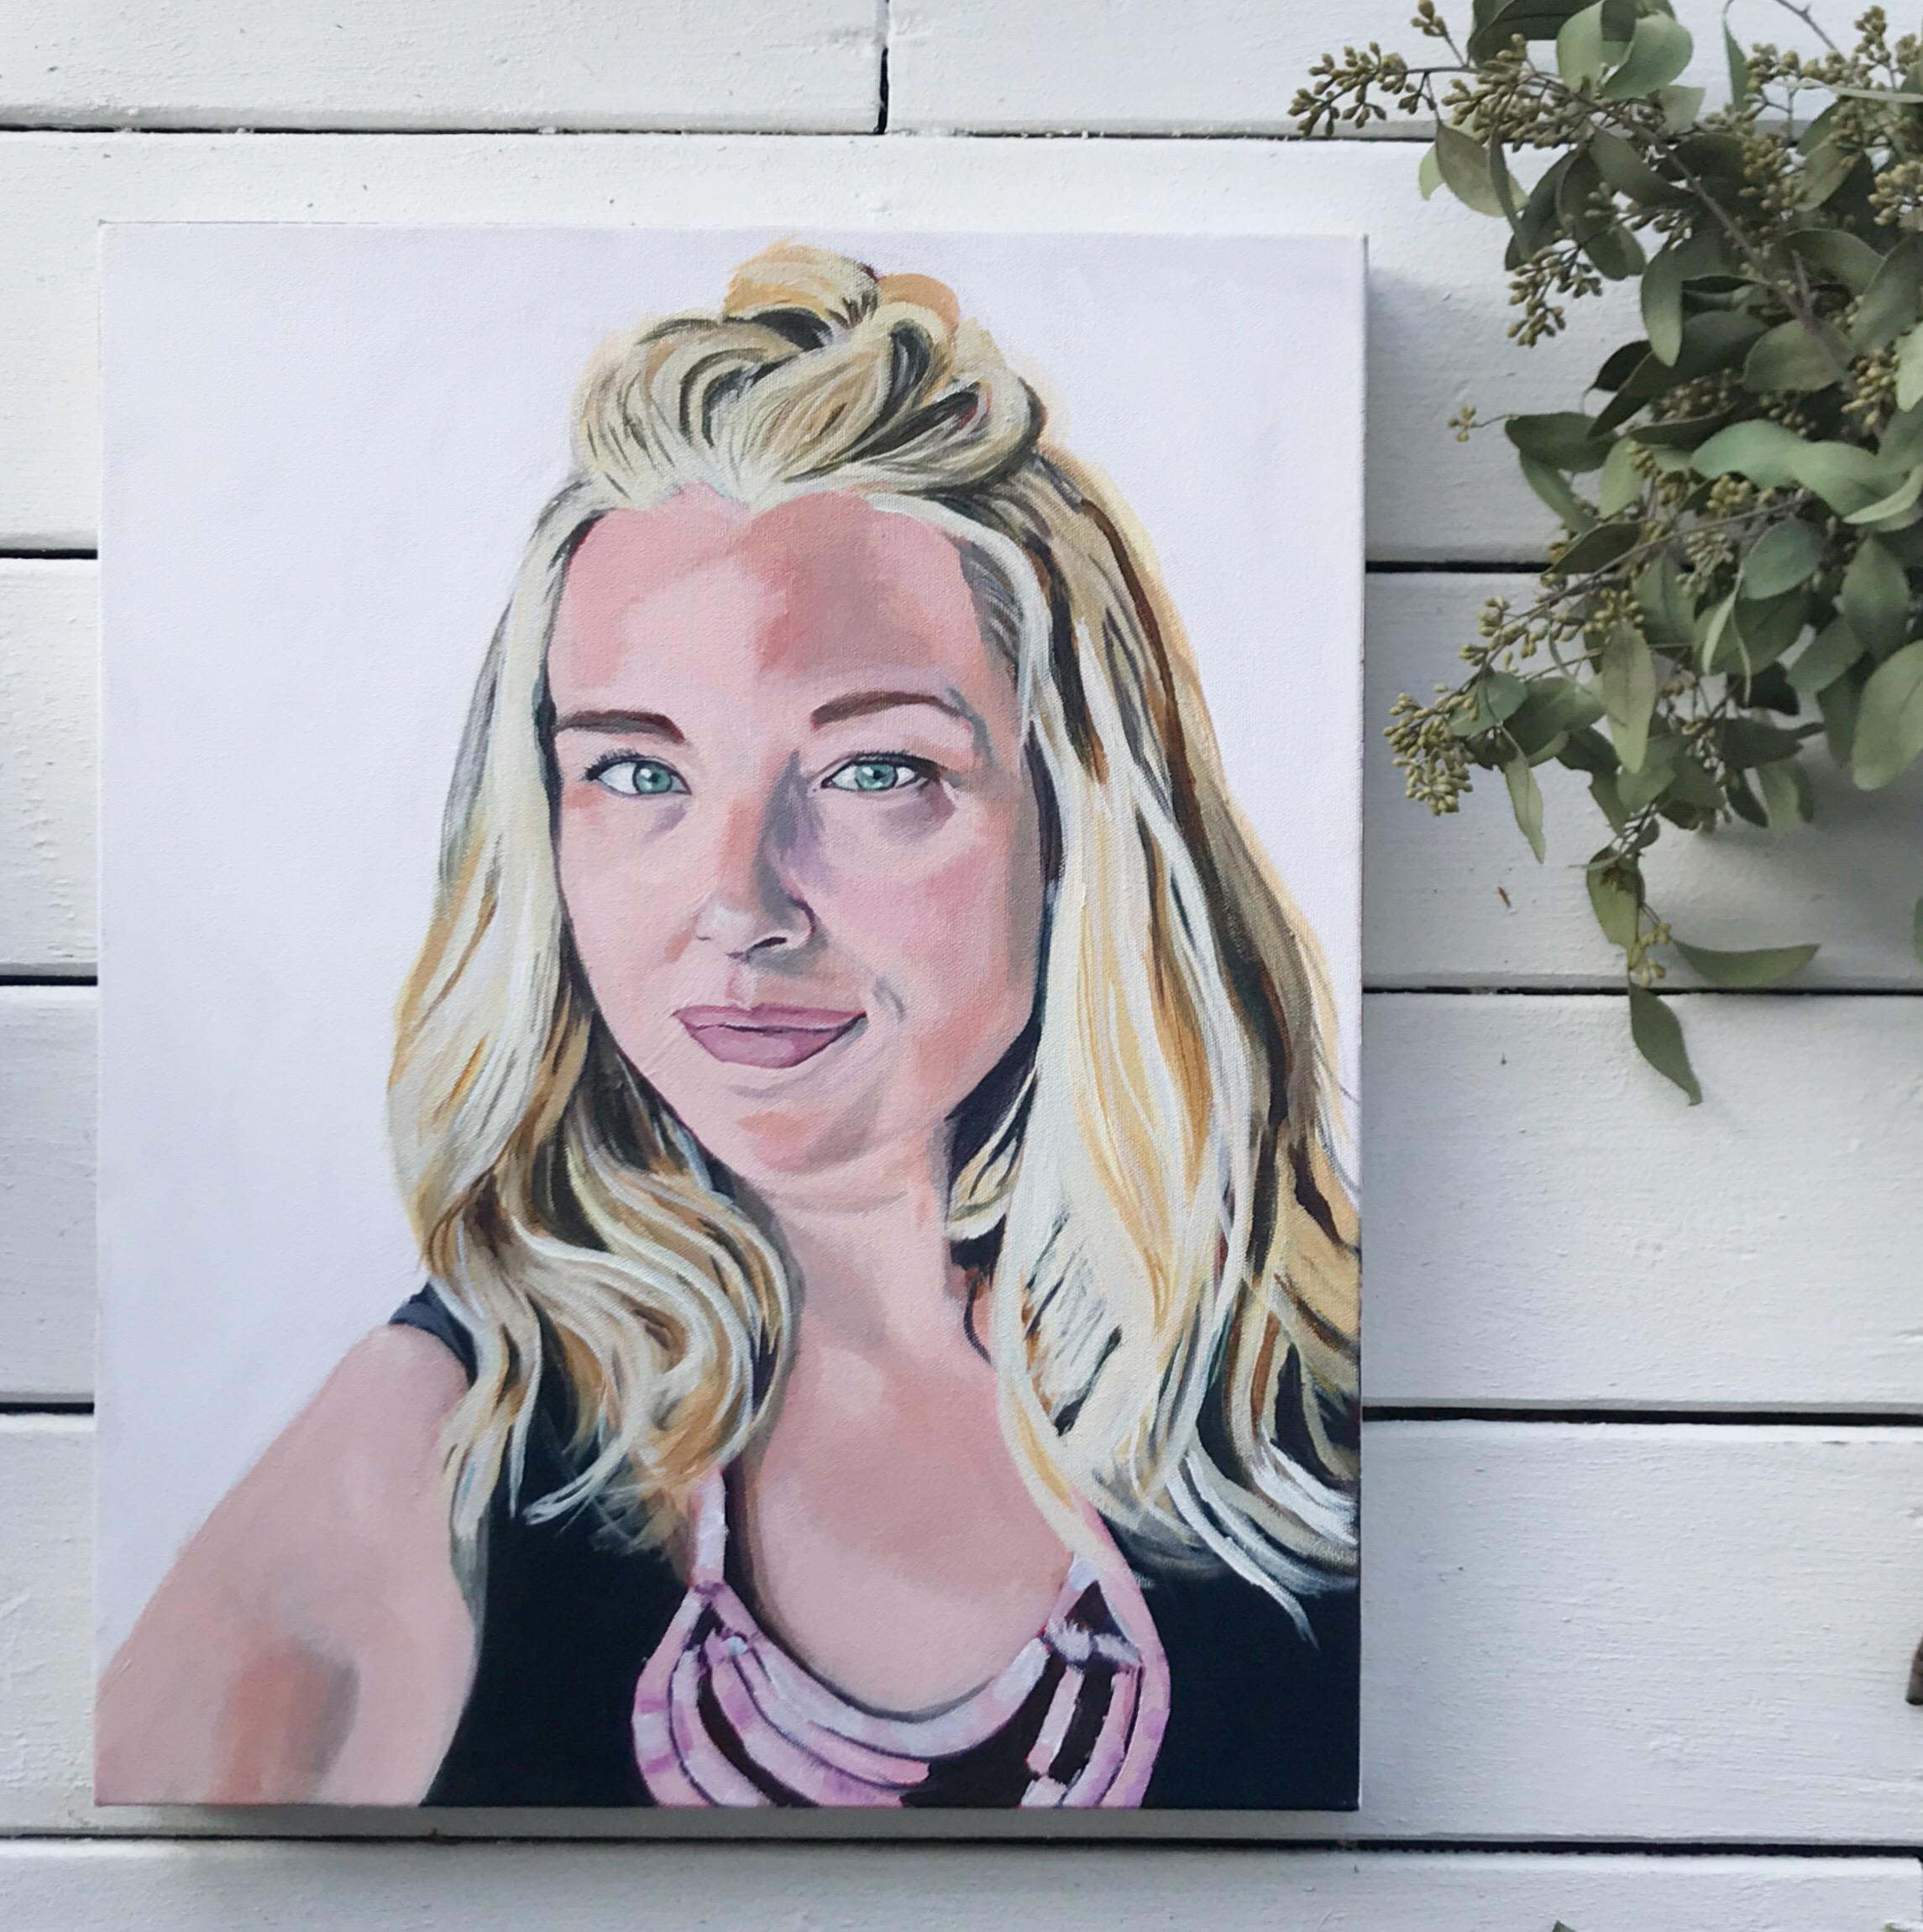 """Heather"" self portrait 16x20"" acrylic on canvas"